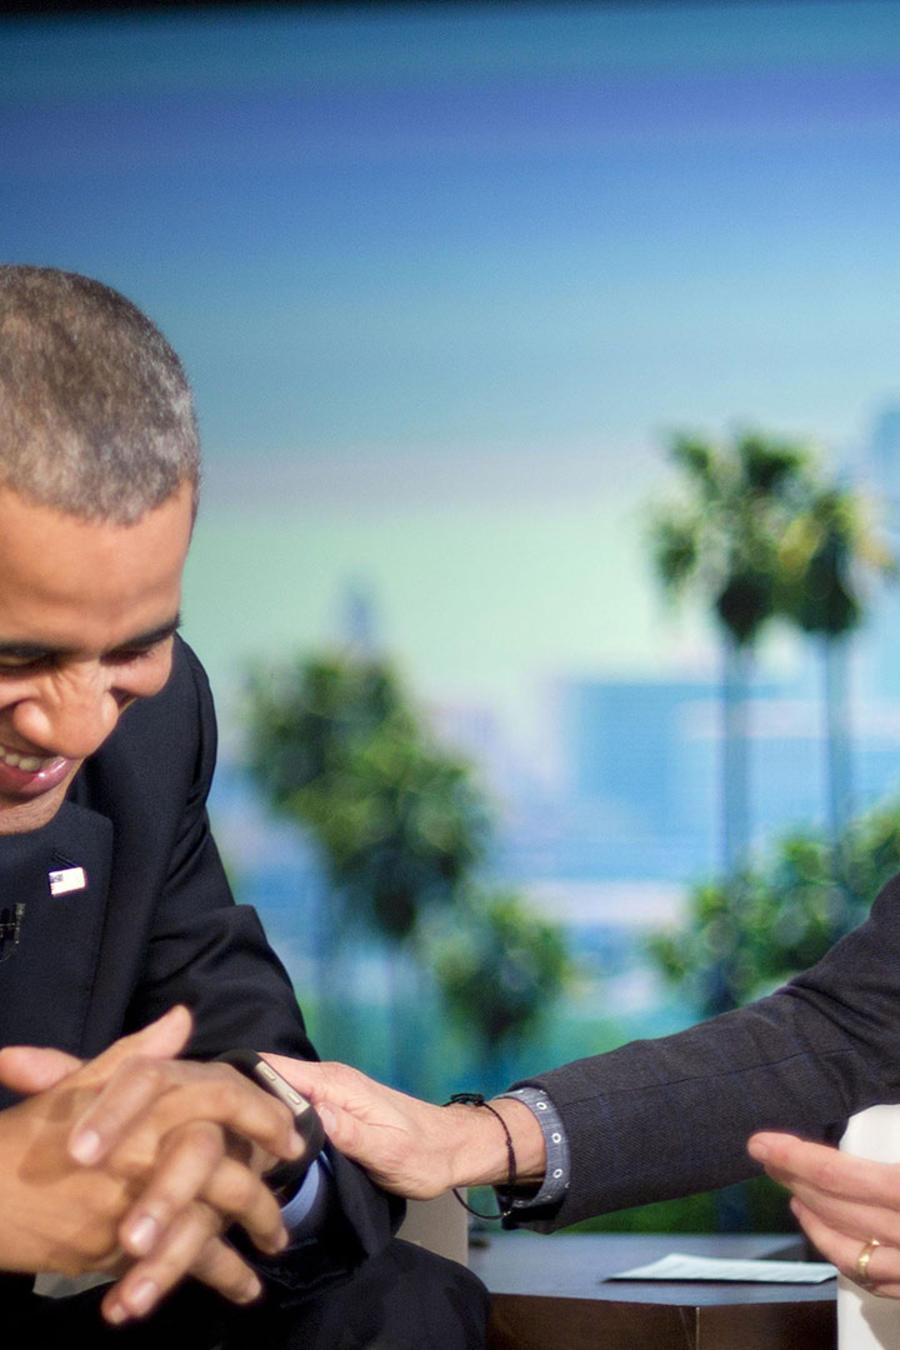 obama junto a ellen degeneres en programa